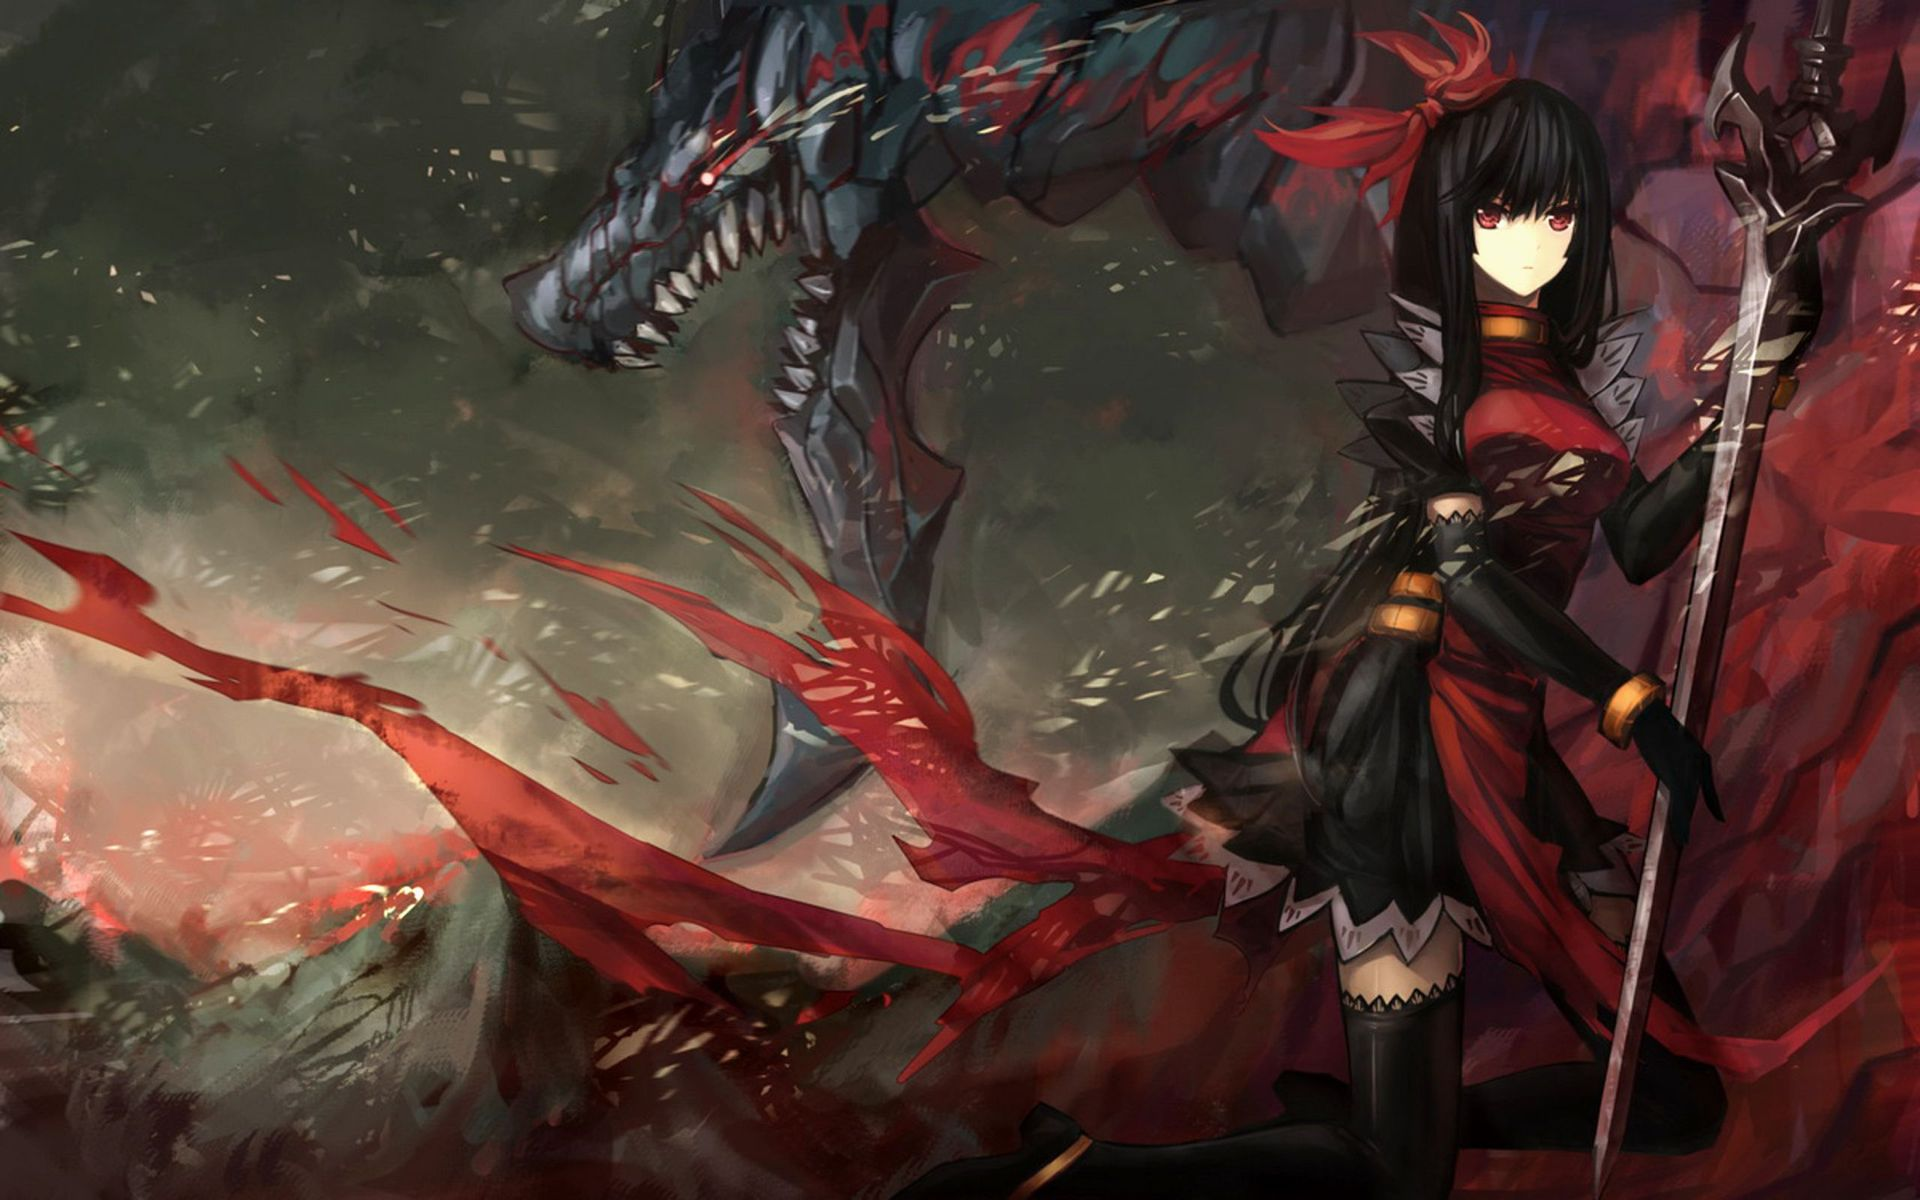 image - anime-girl-warrior-anime-hd-wallpaper-1920x1200-9721